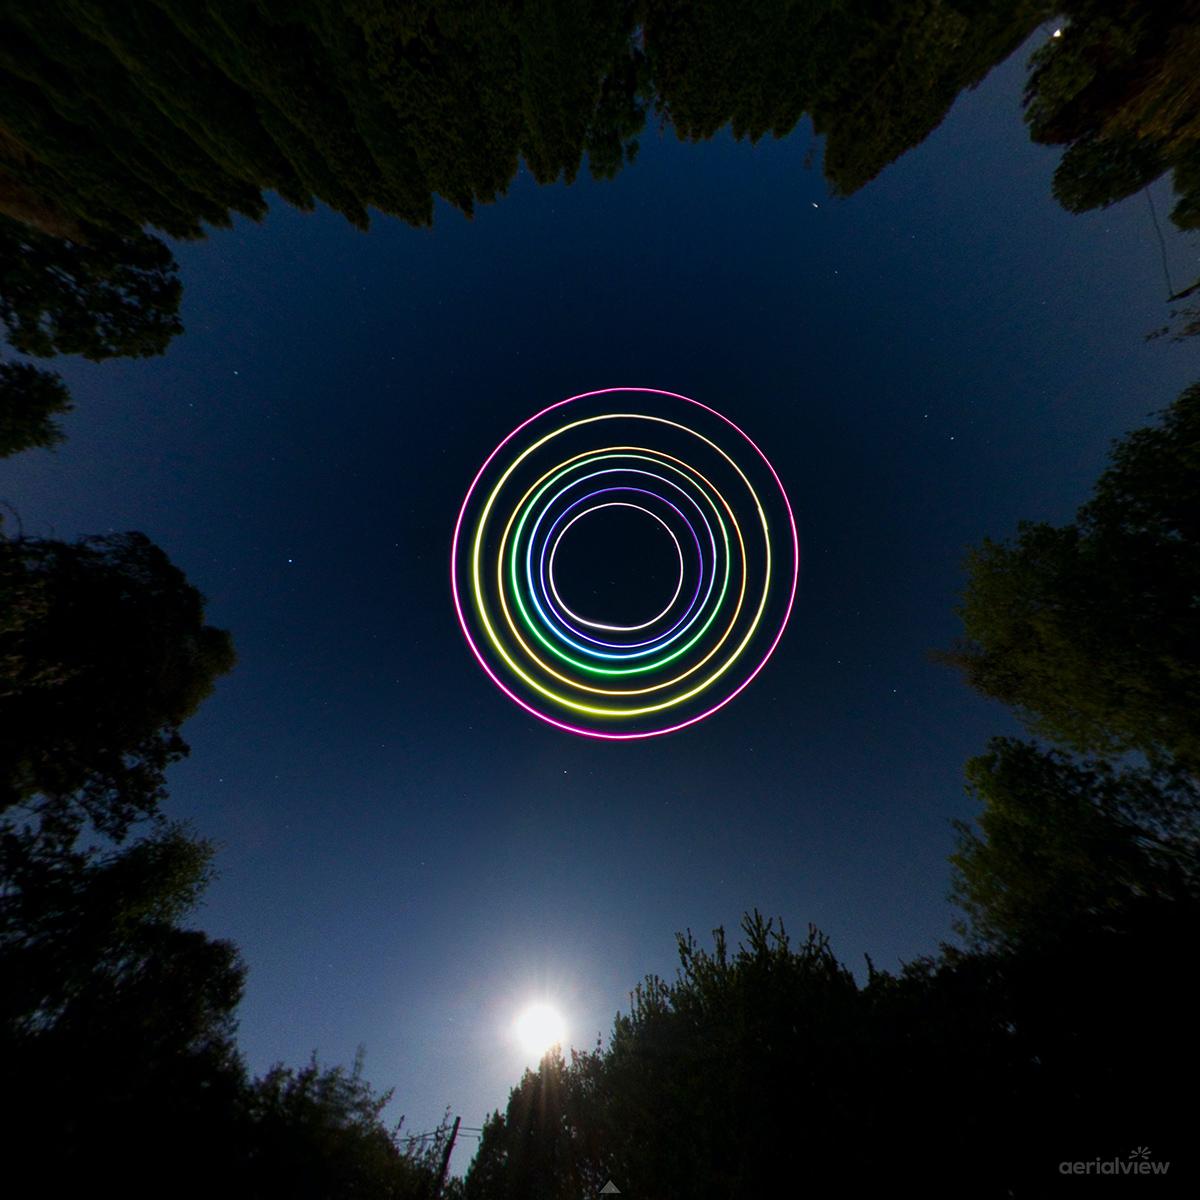 https://aerialview.info/wp-content/uploads/2021/02/lightpaint_sq_1200x1200.jpg